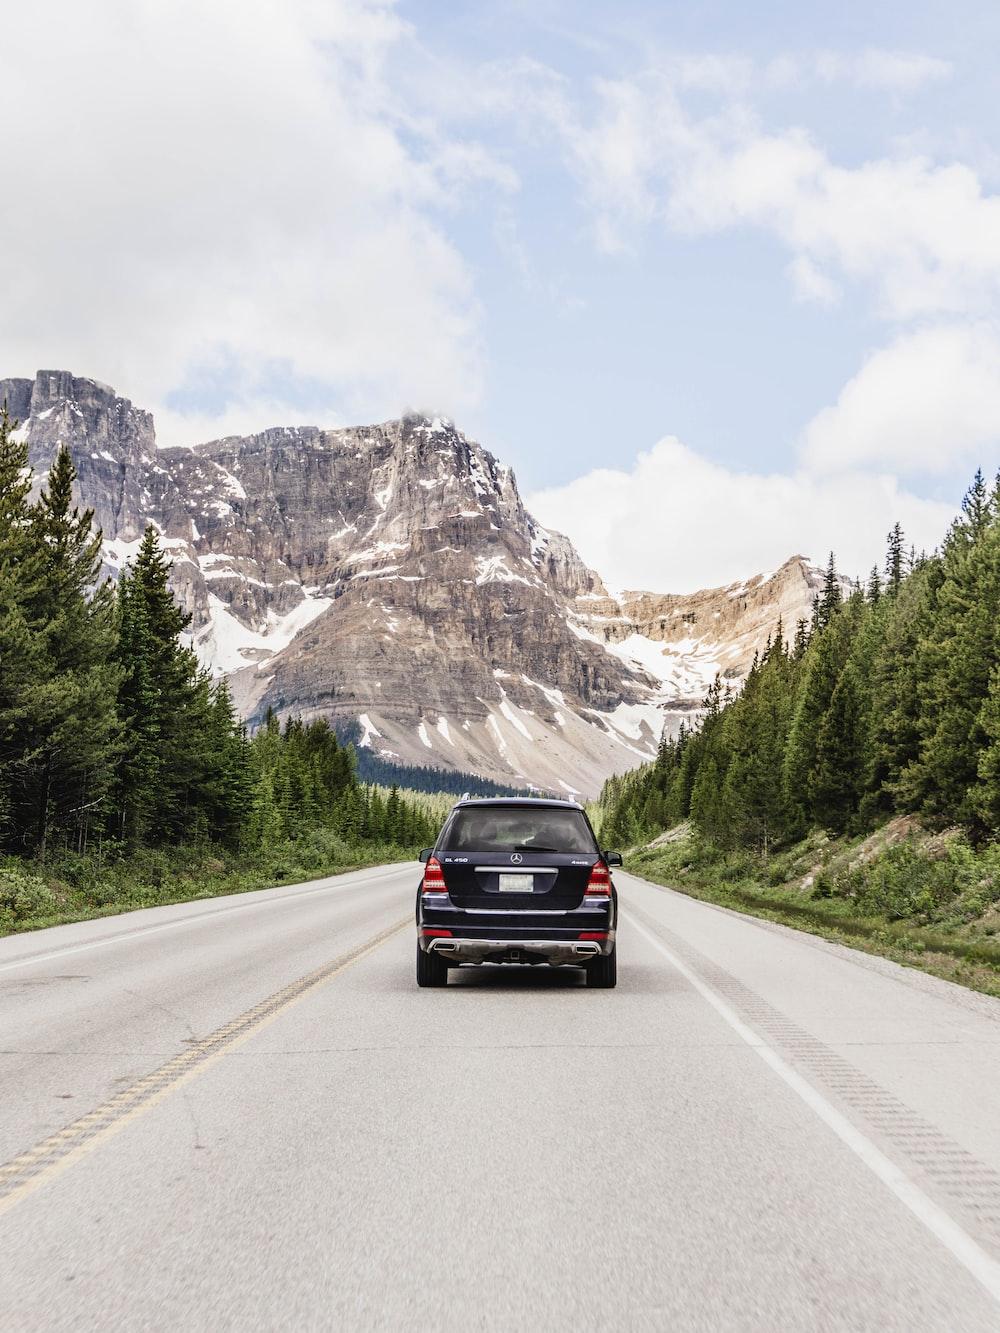 black car on road near mountain range